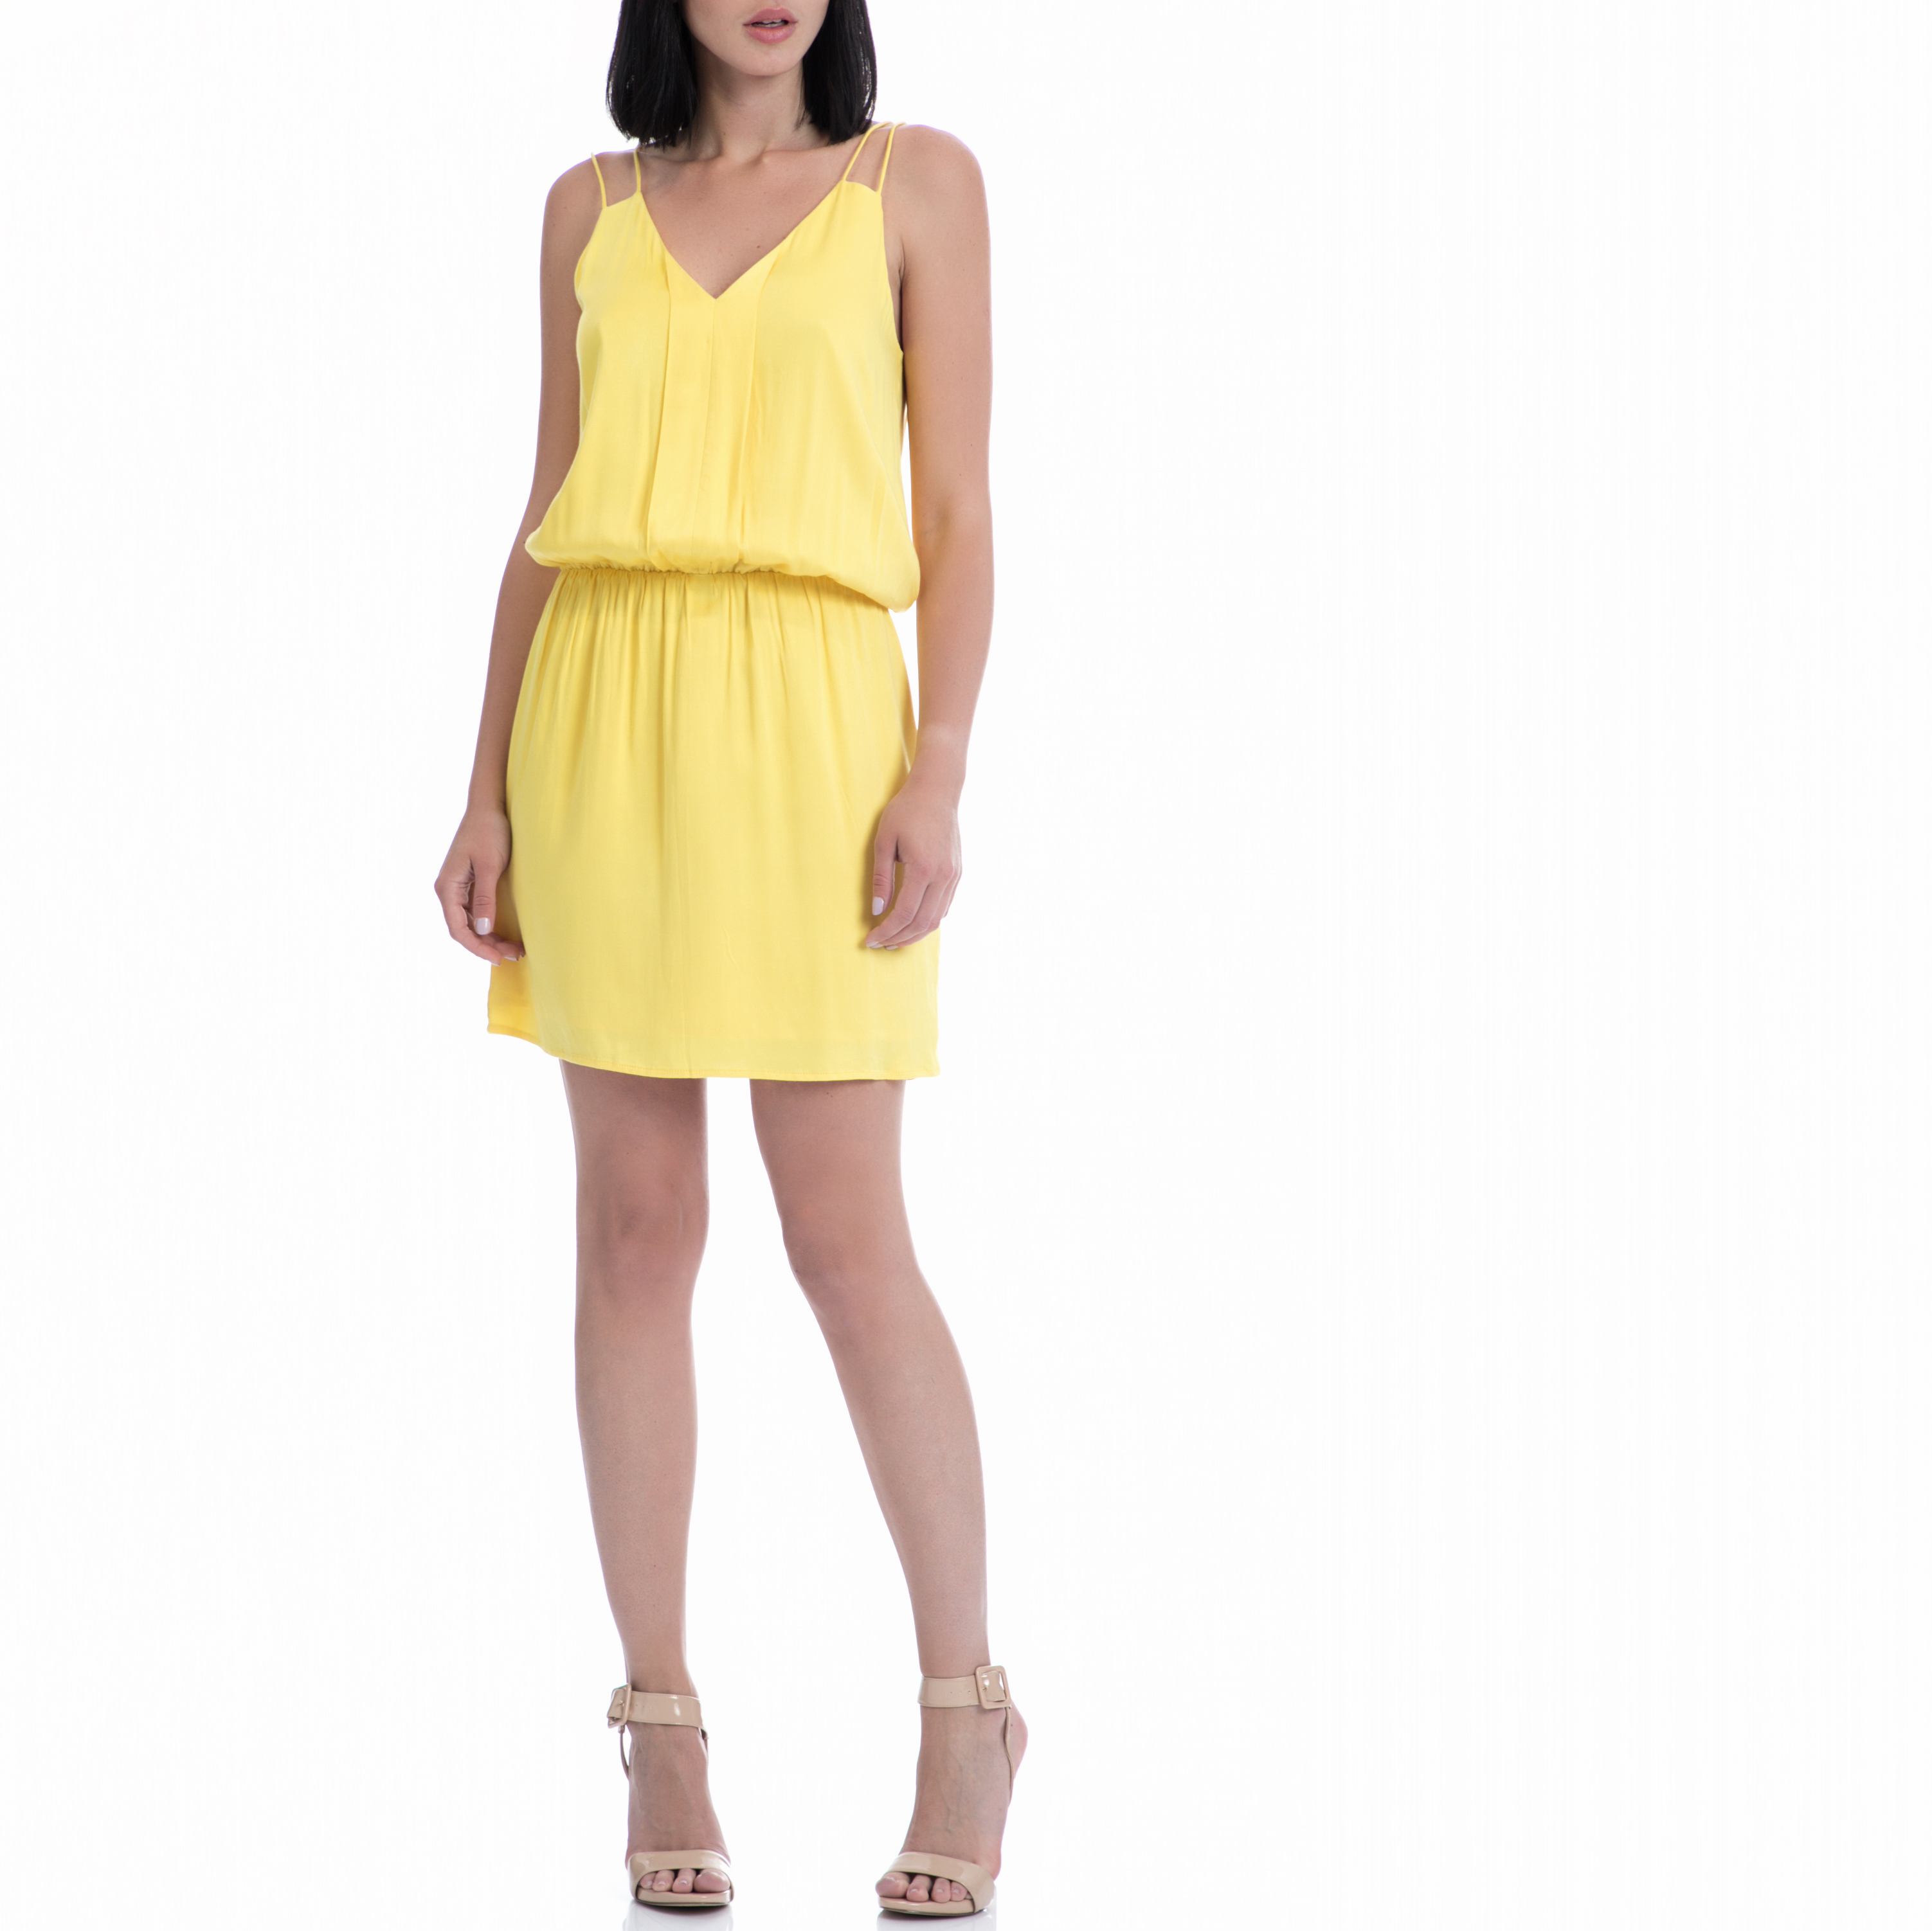 MOTIVI - Φόρεμα MOTIVI κίτρινο γυναικεία ρούχα φορέματα μίνι